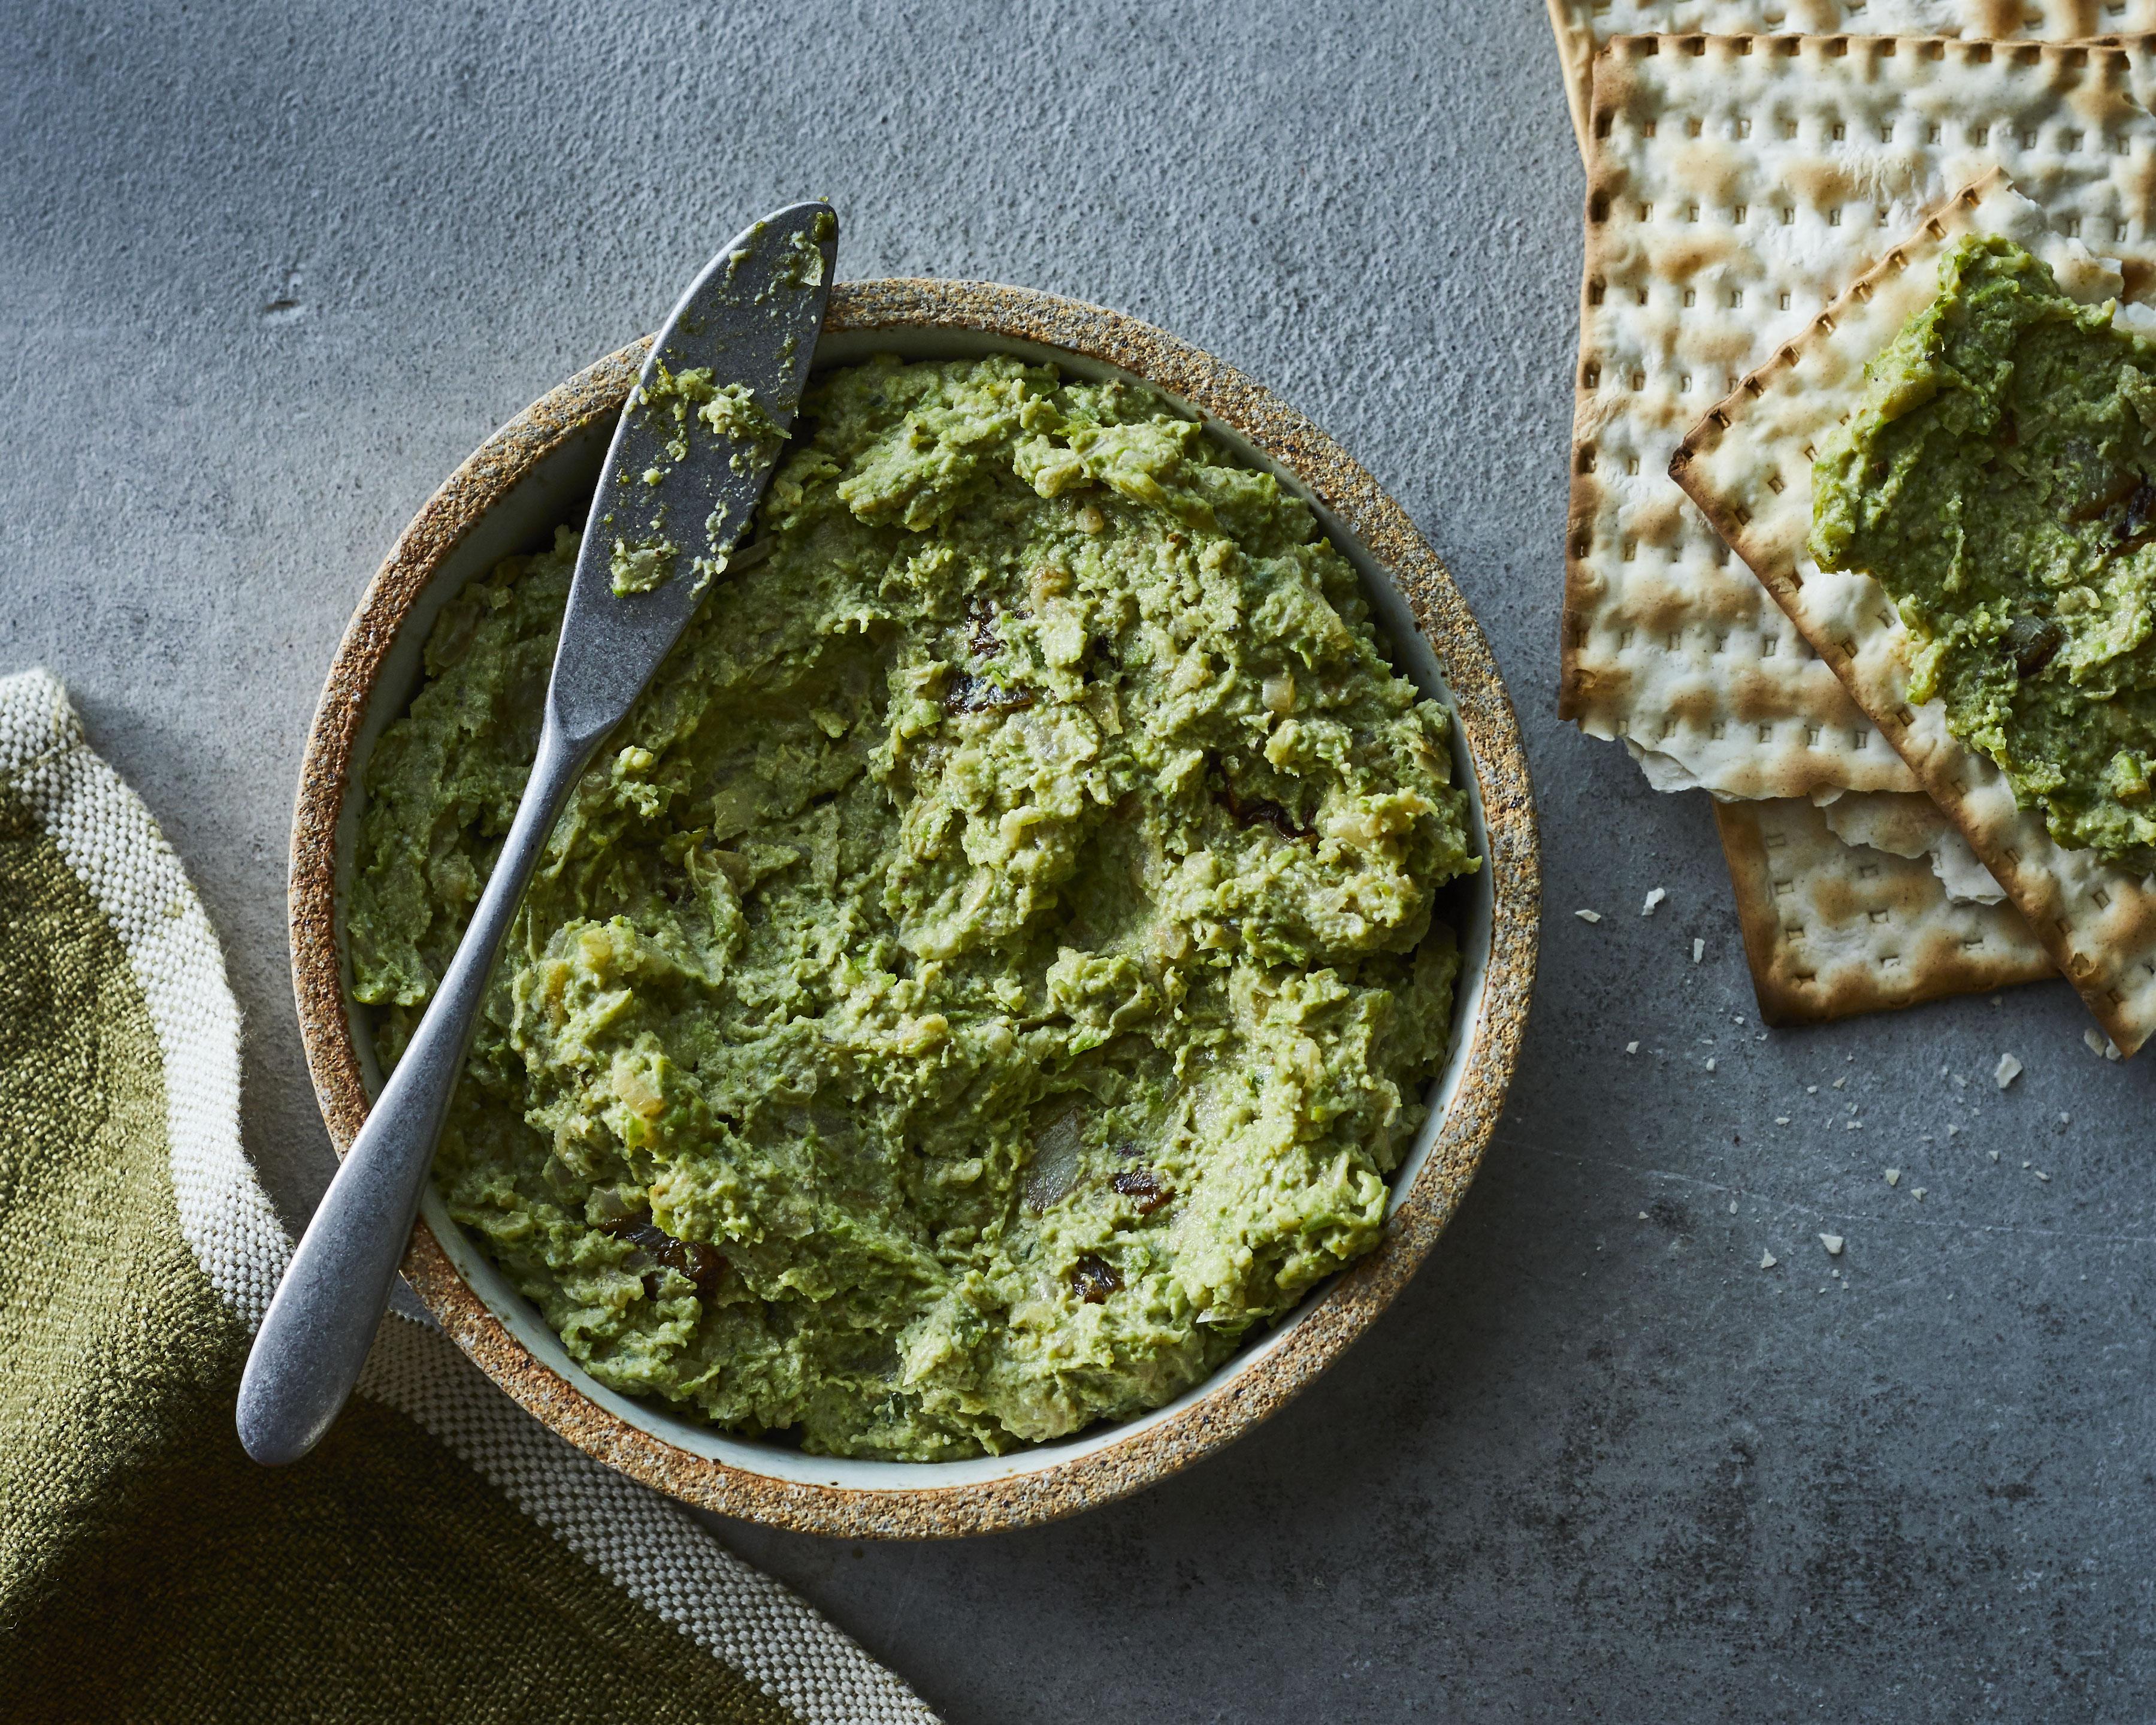 su-Safta's Mock Liver (Green Bean and Pea Pâté)